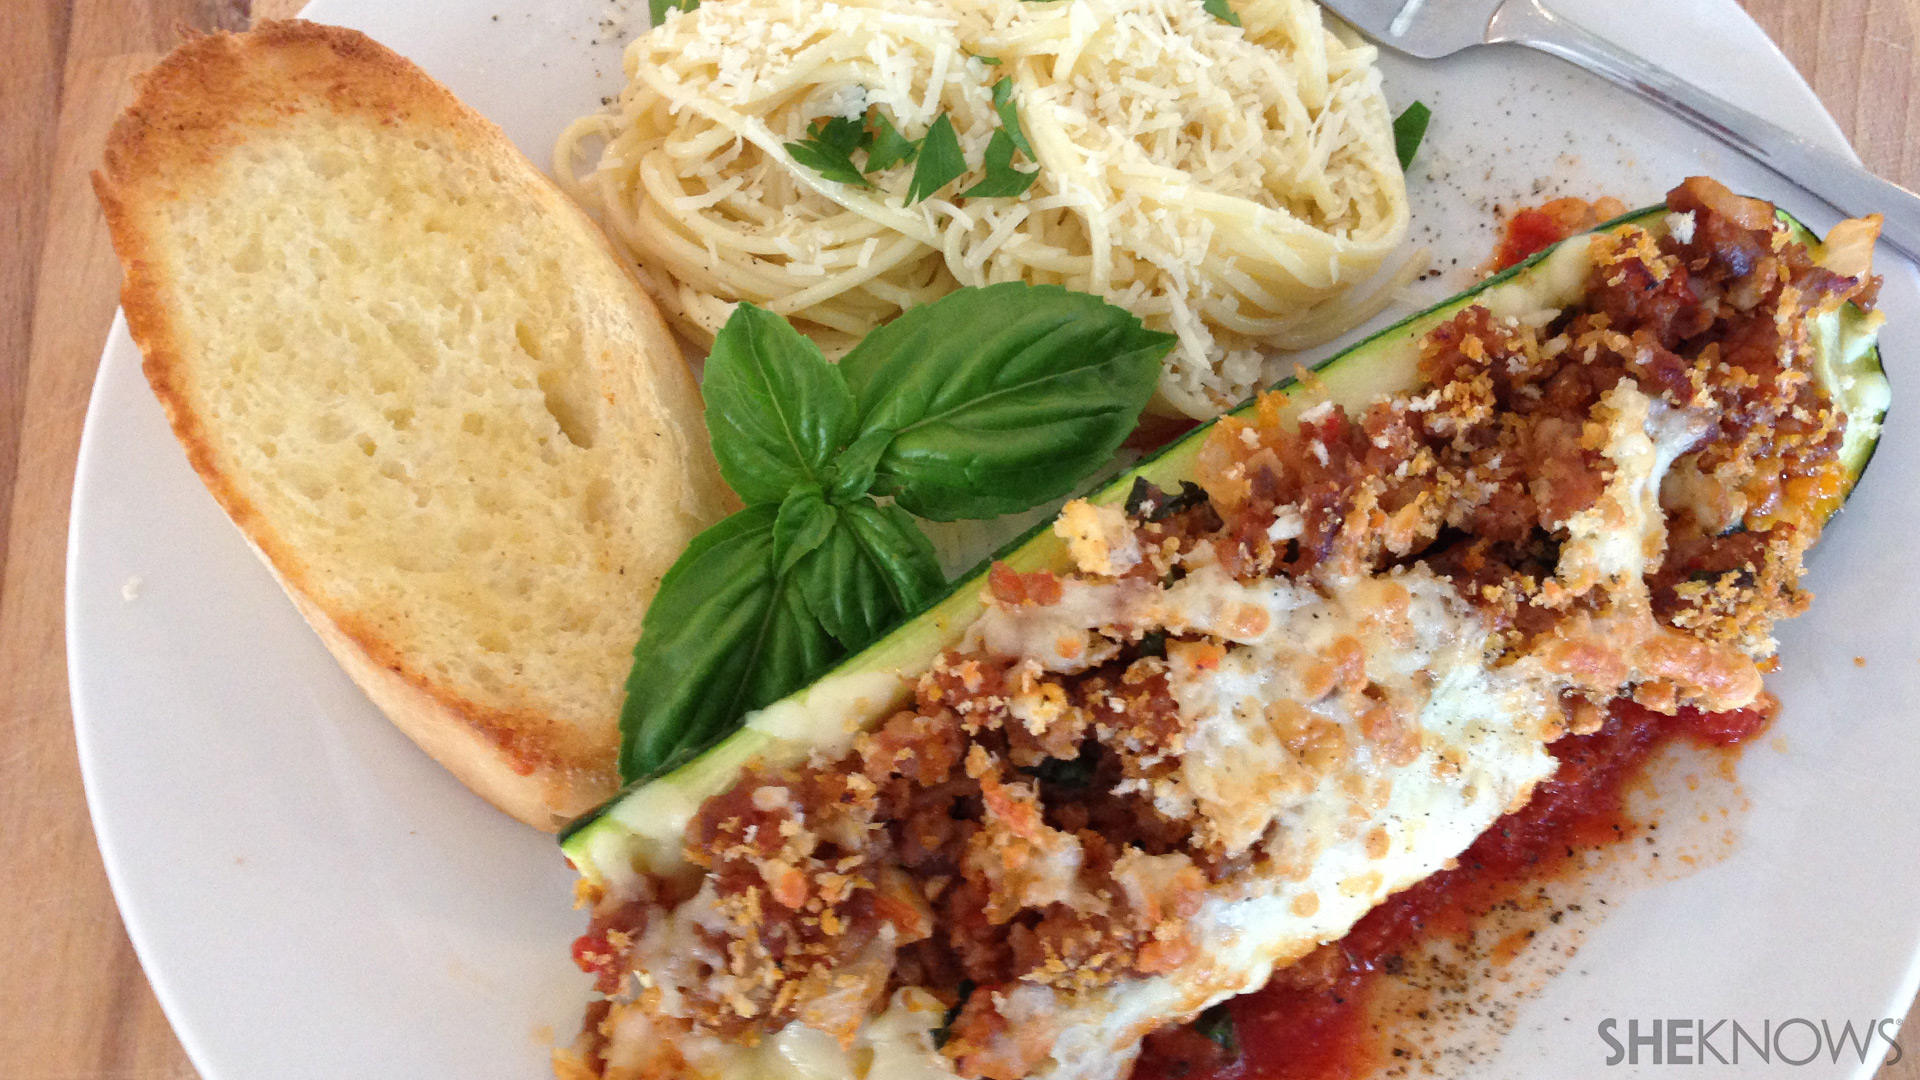 Zucchini boats | Sheknows.ca - final product